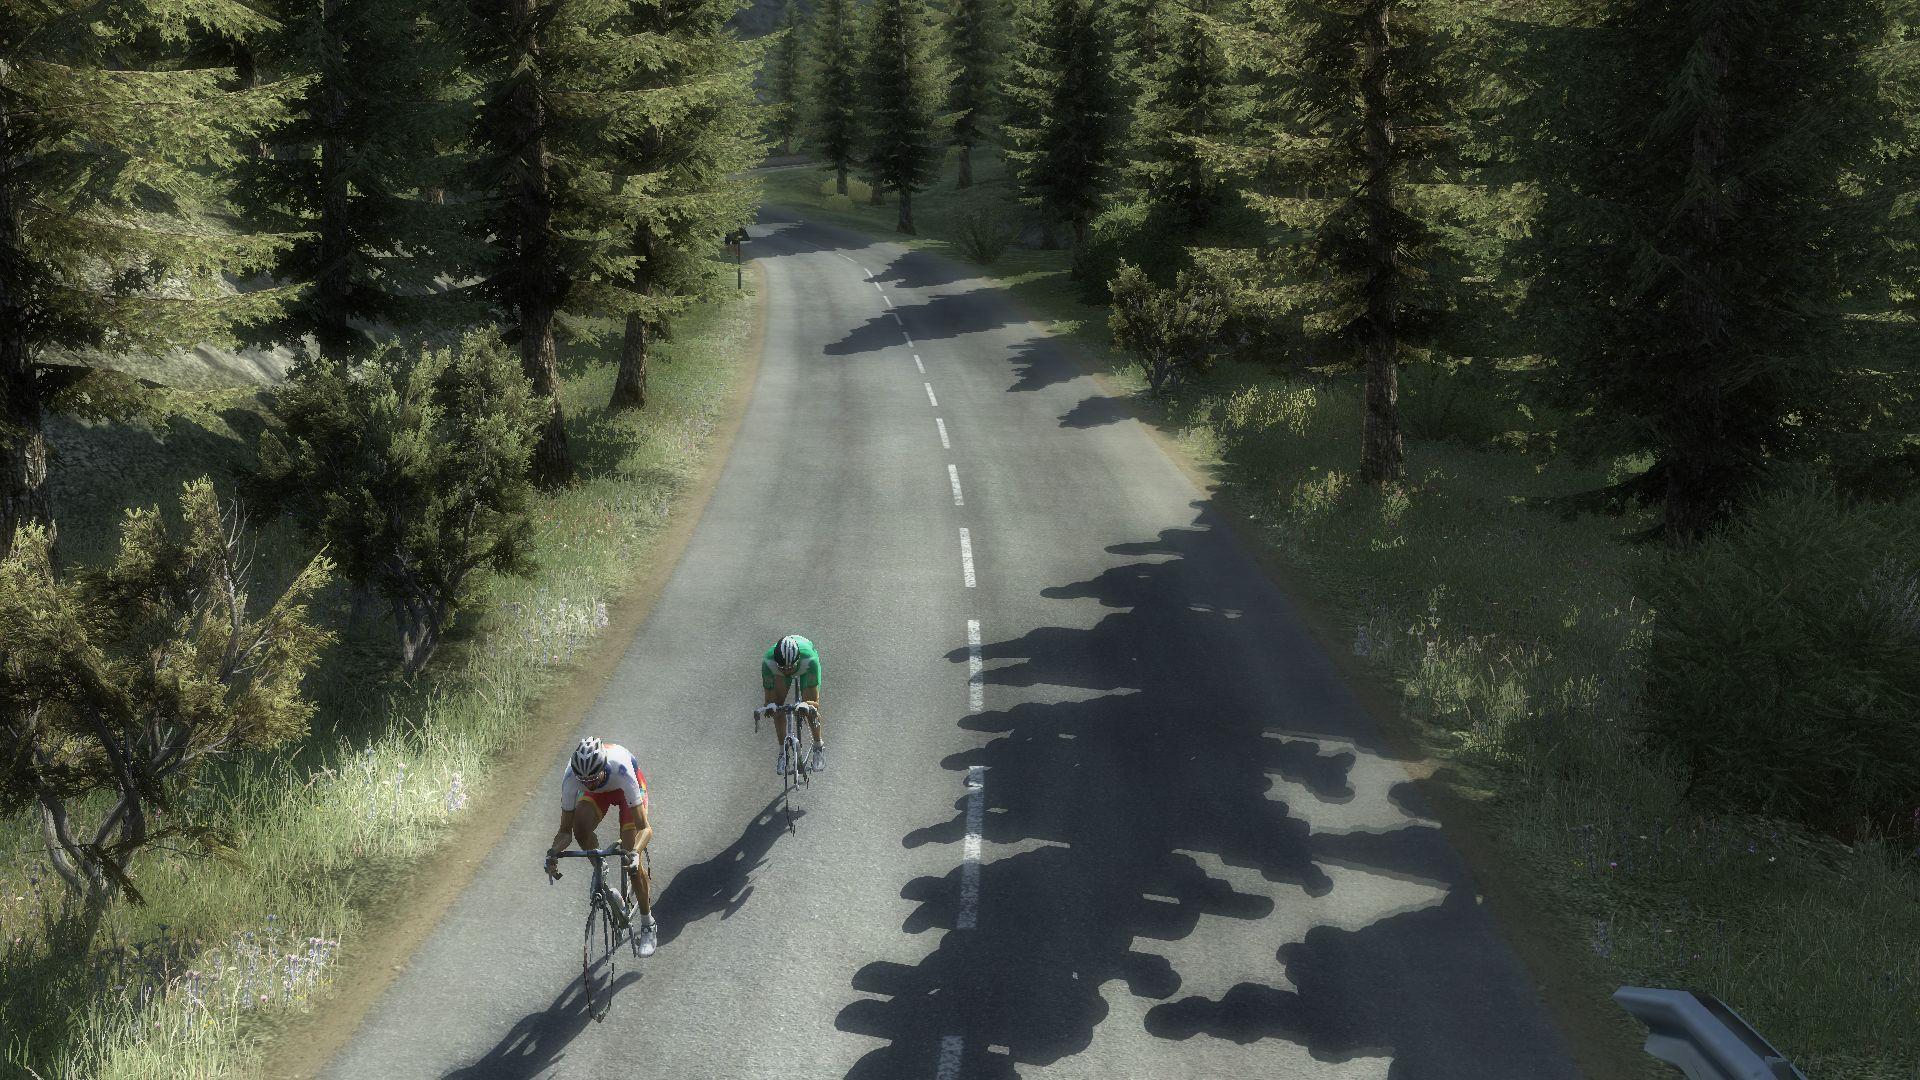 pcmdaily.com/images/mg/2017/Races/U23/Avenir/AVES7%2025.jpg